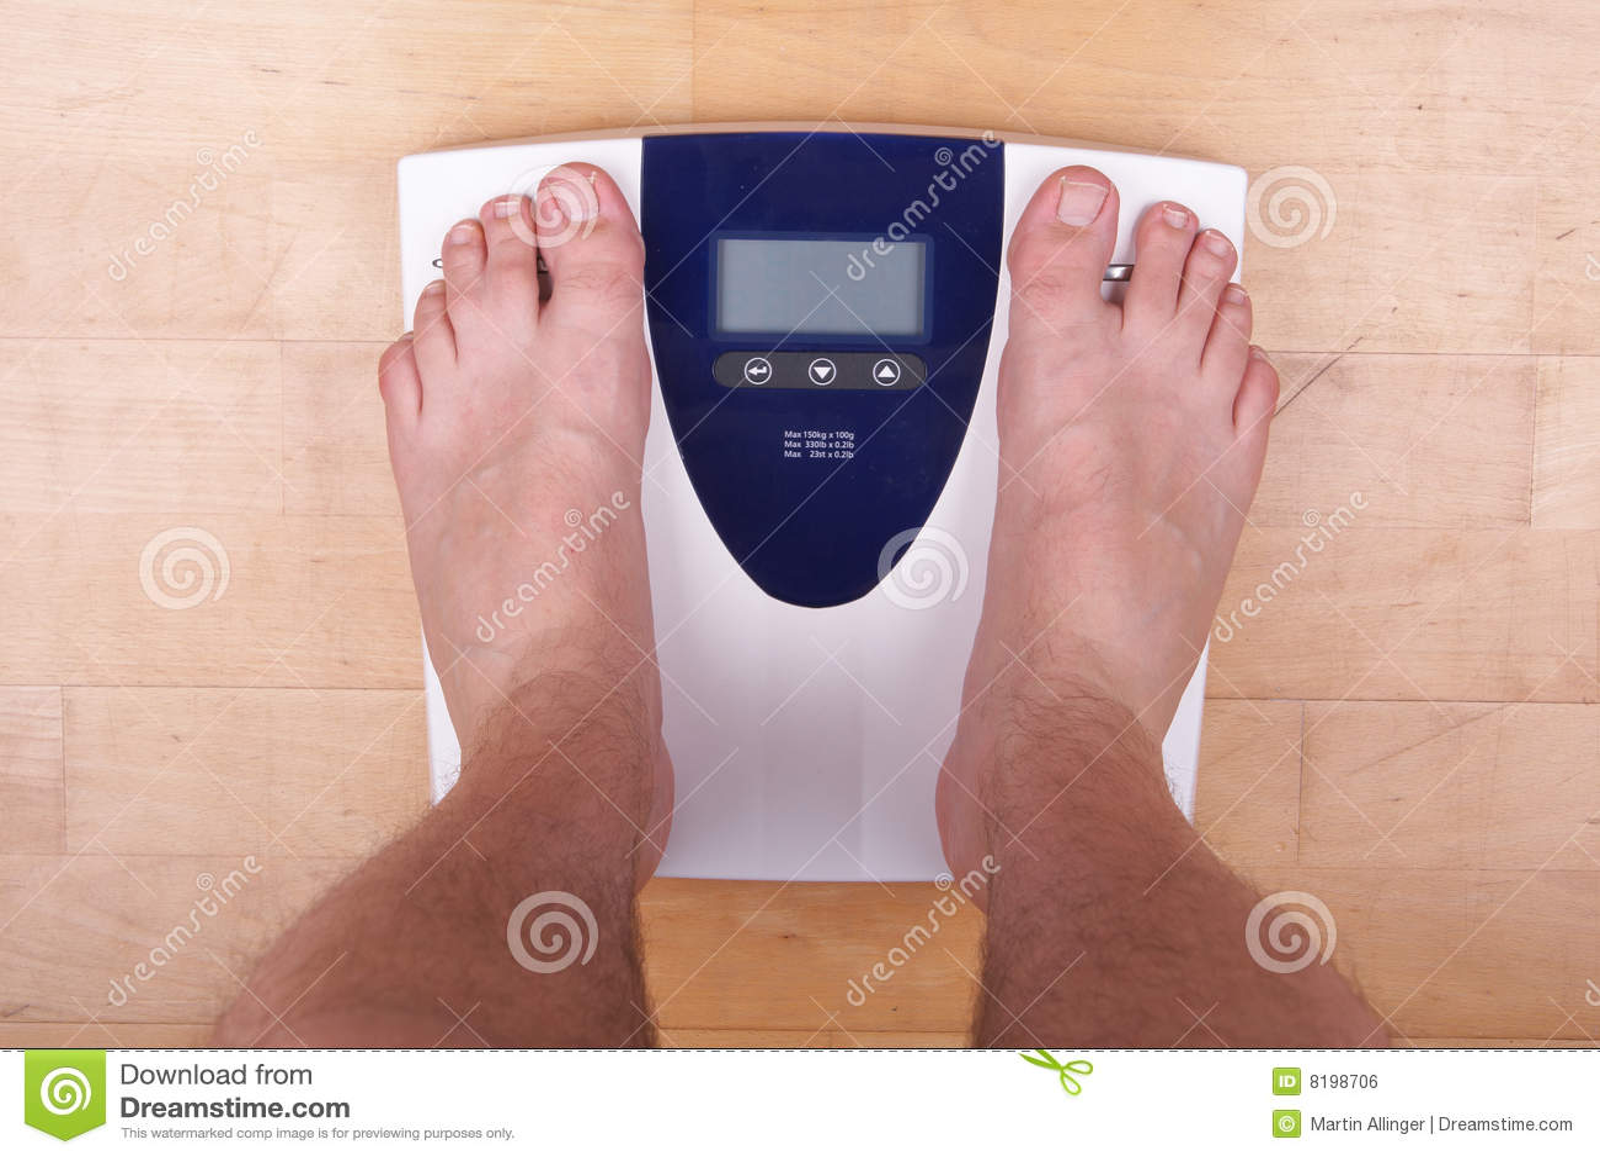 2 fot scale